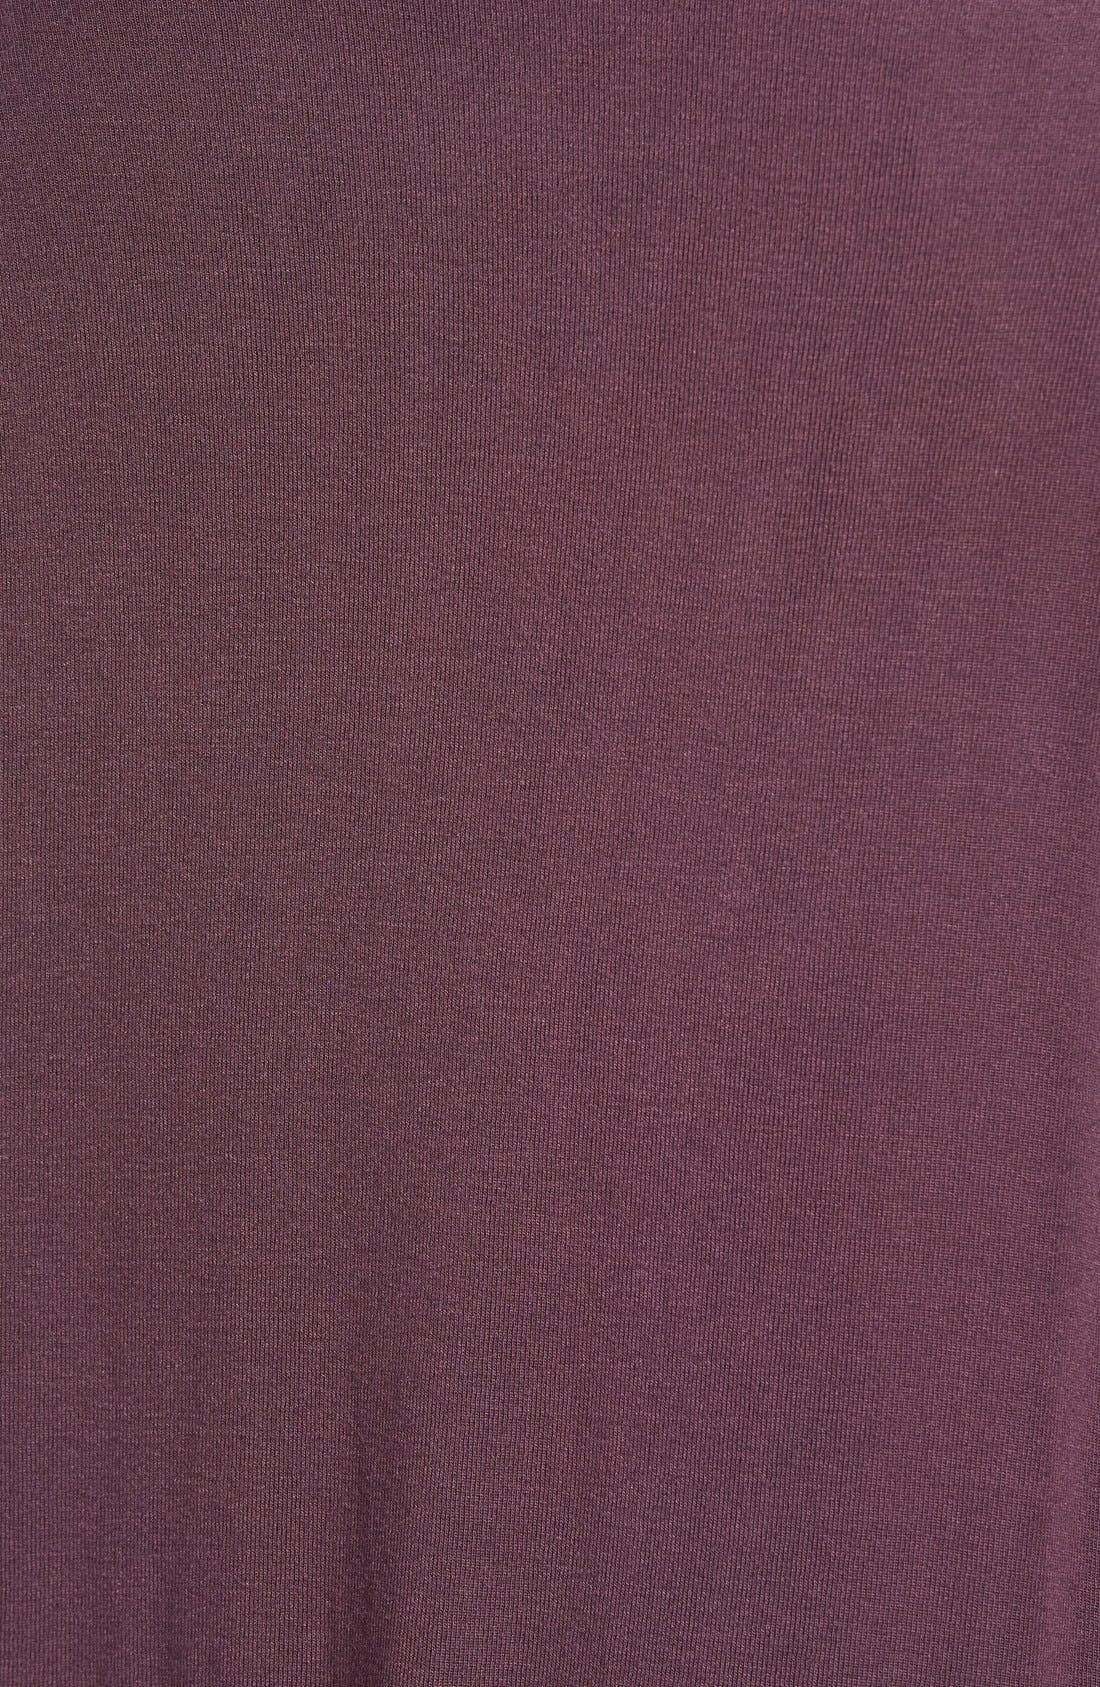 High/Low Jersey Cardigan,                             Alternate thumbnail 4, color,                             BURGUNDY STEM